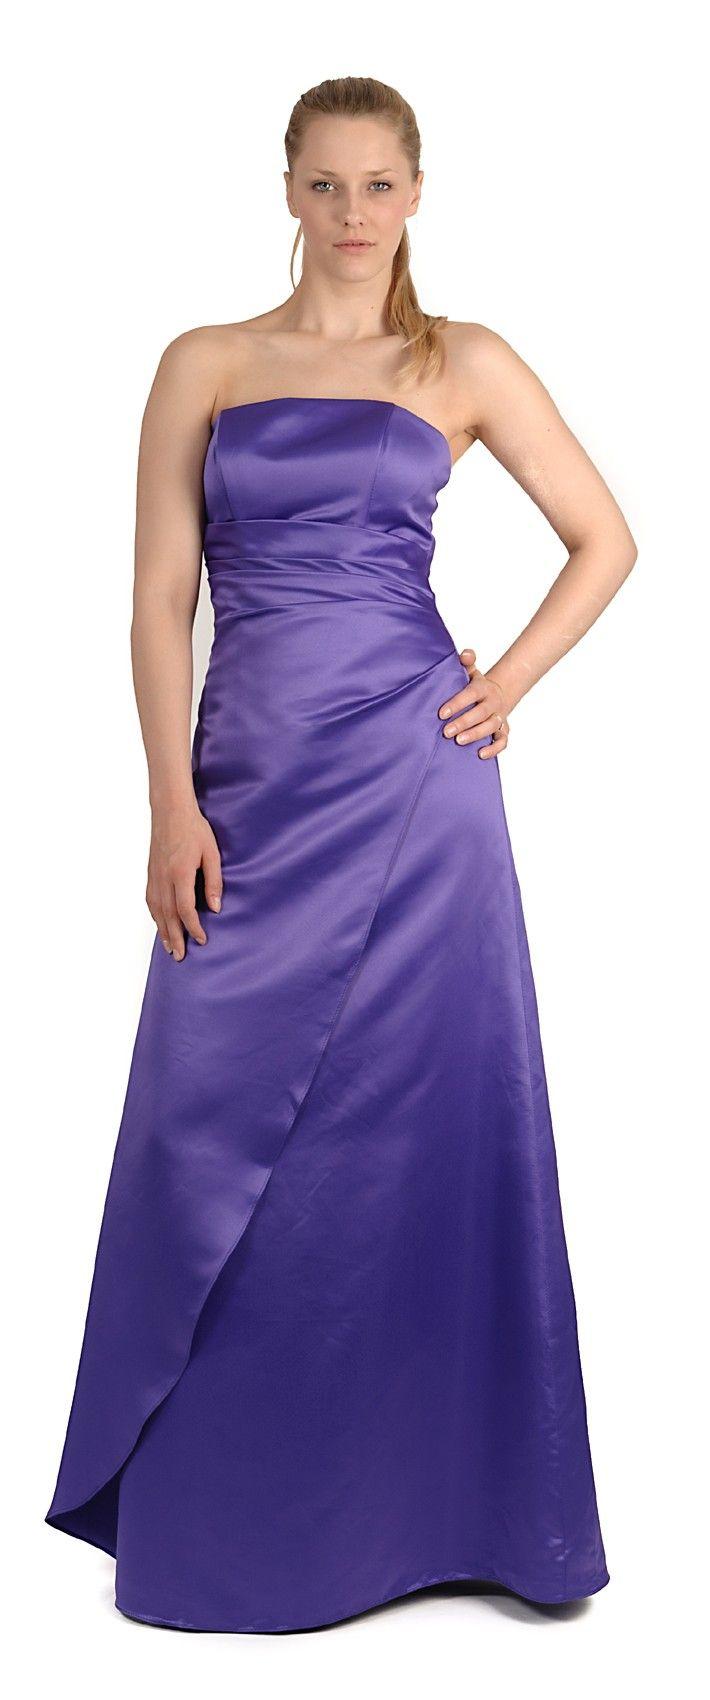 Purple flower girl dresses sleevless for kids google search explore purple flower girl dresses and more ombrellifo Image collections